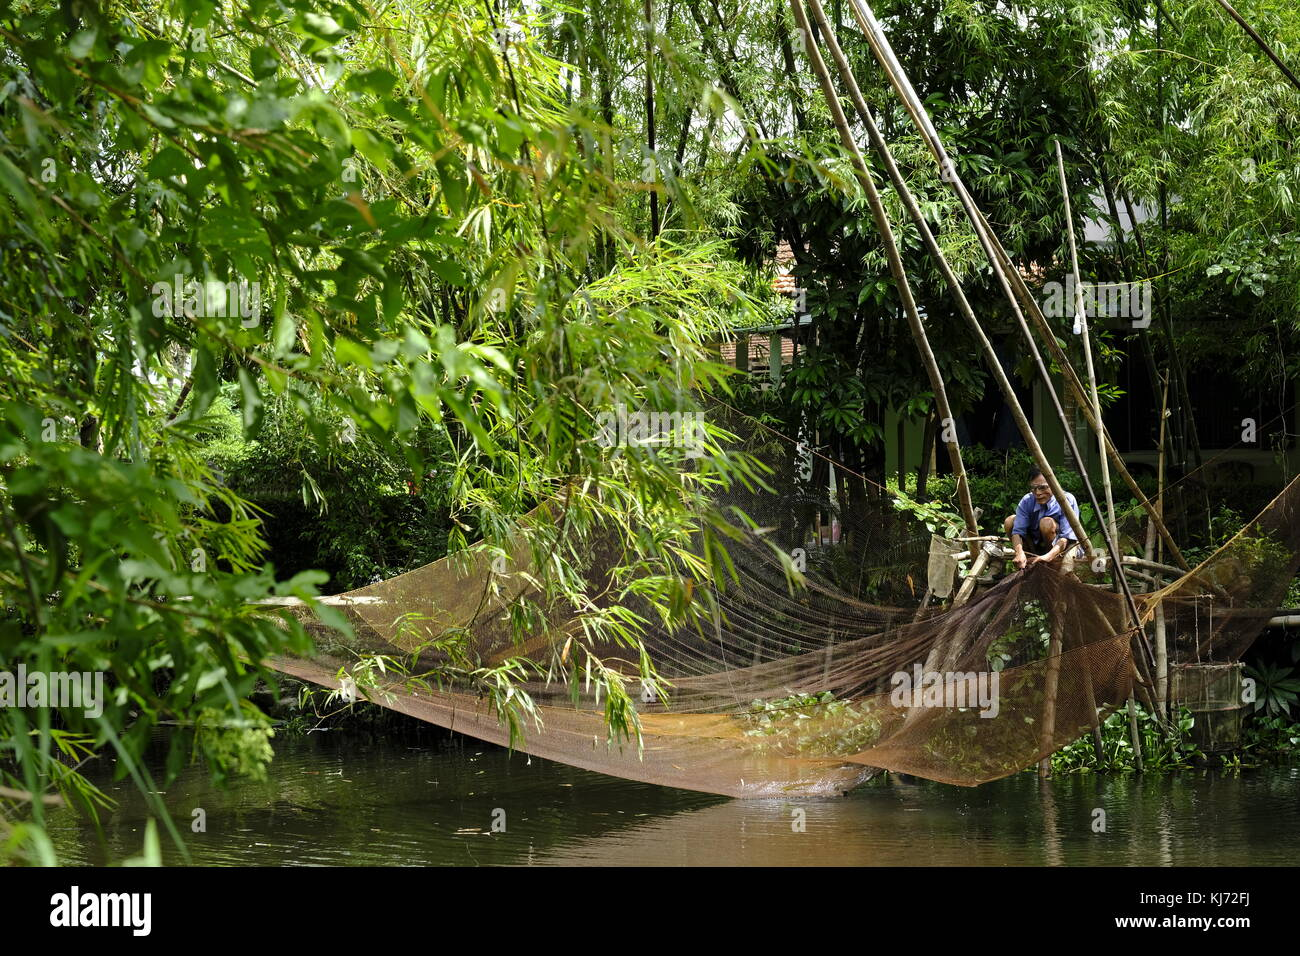 Asian man mending a lift fishing net next to a river in Vietnam - Stock Image